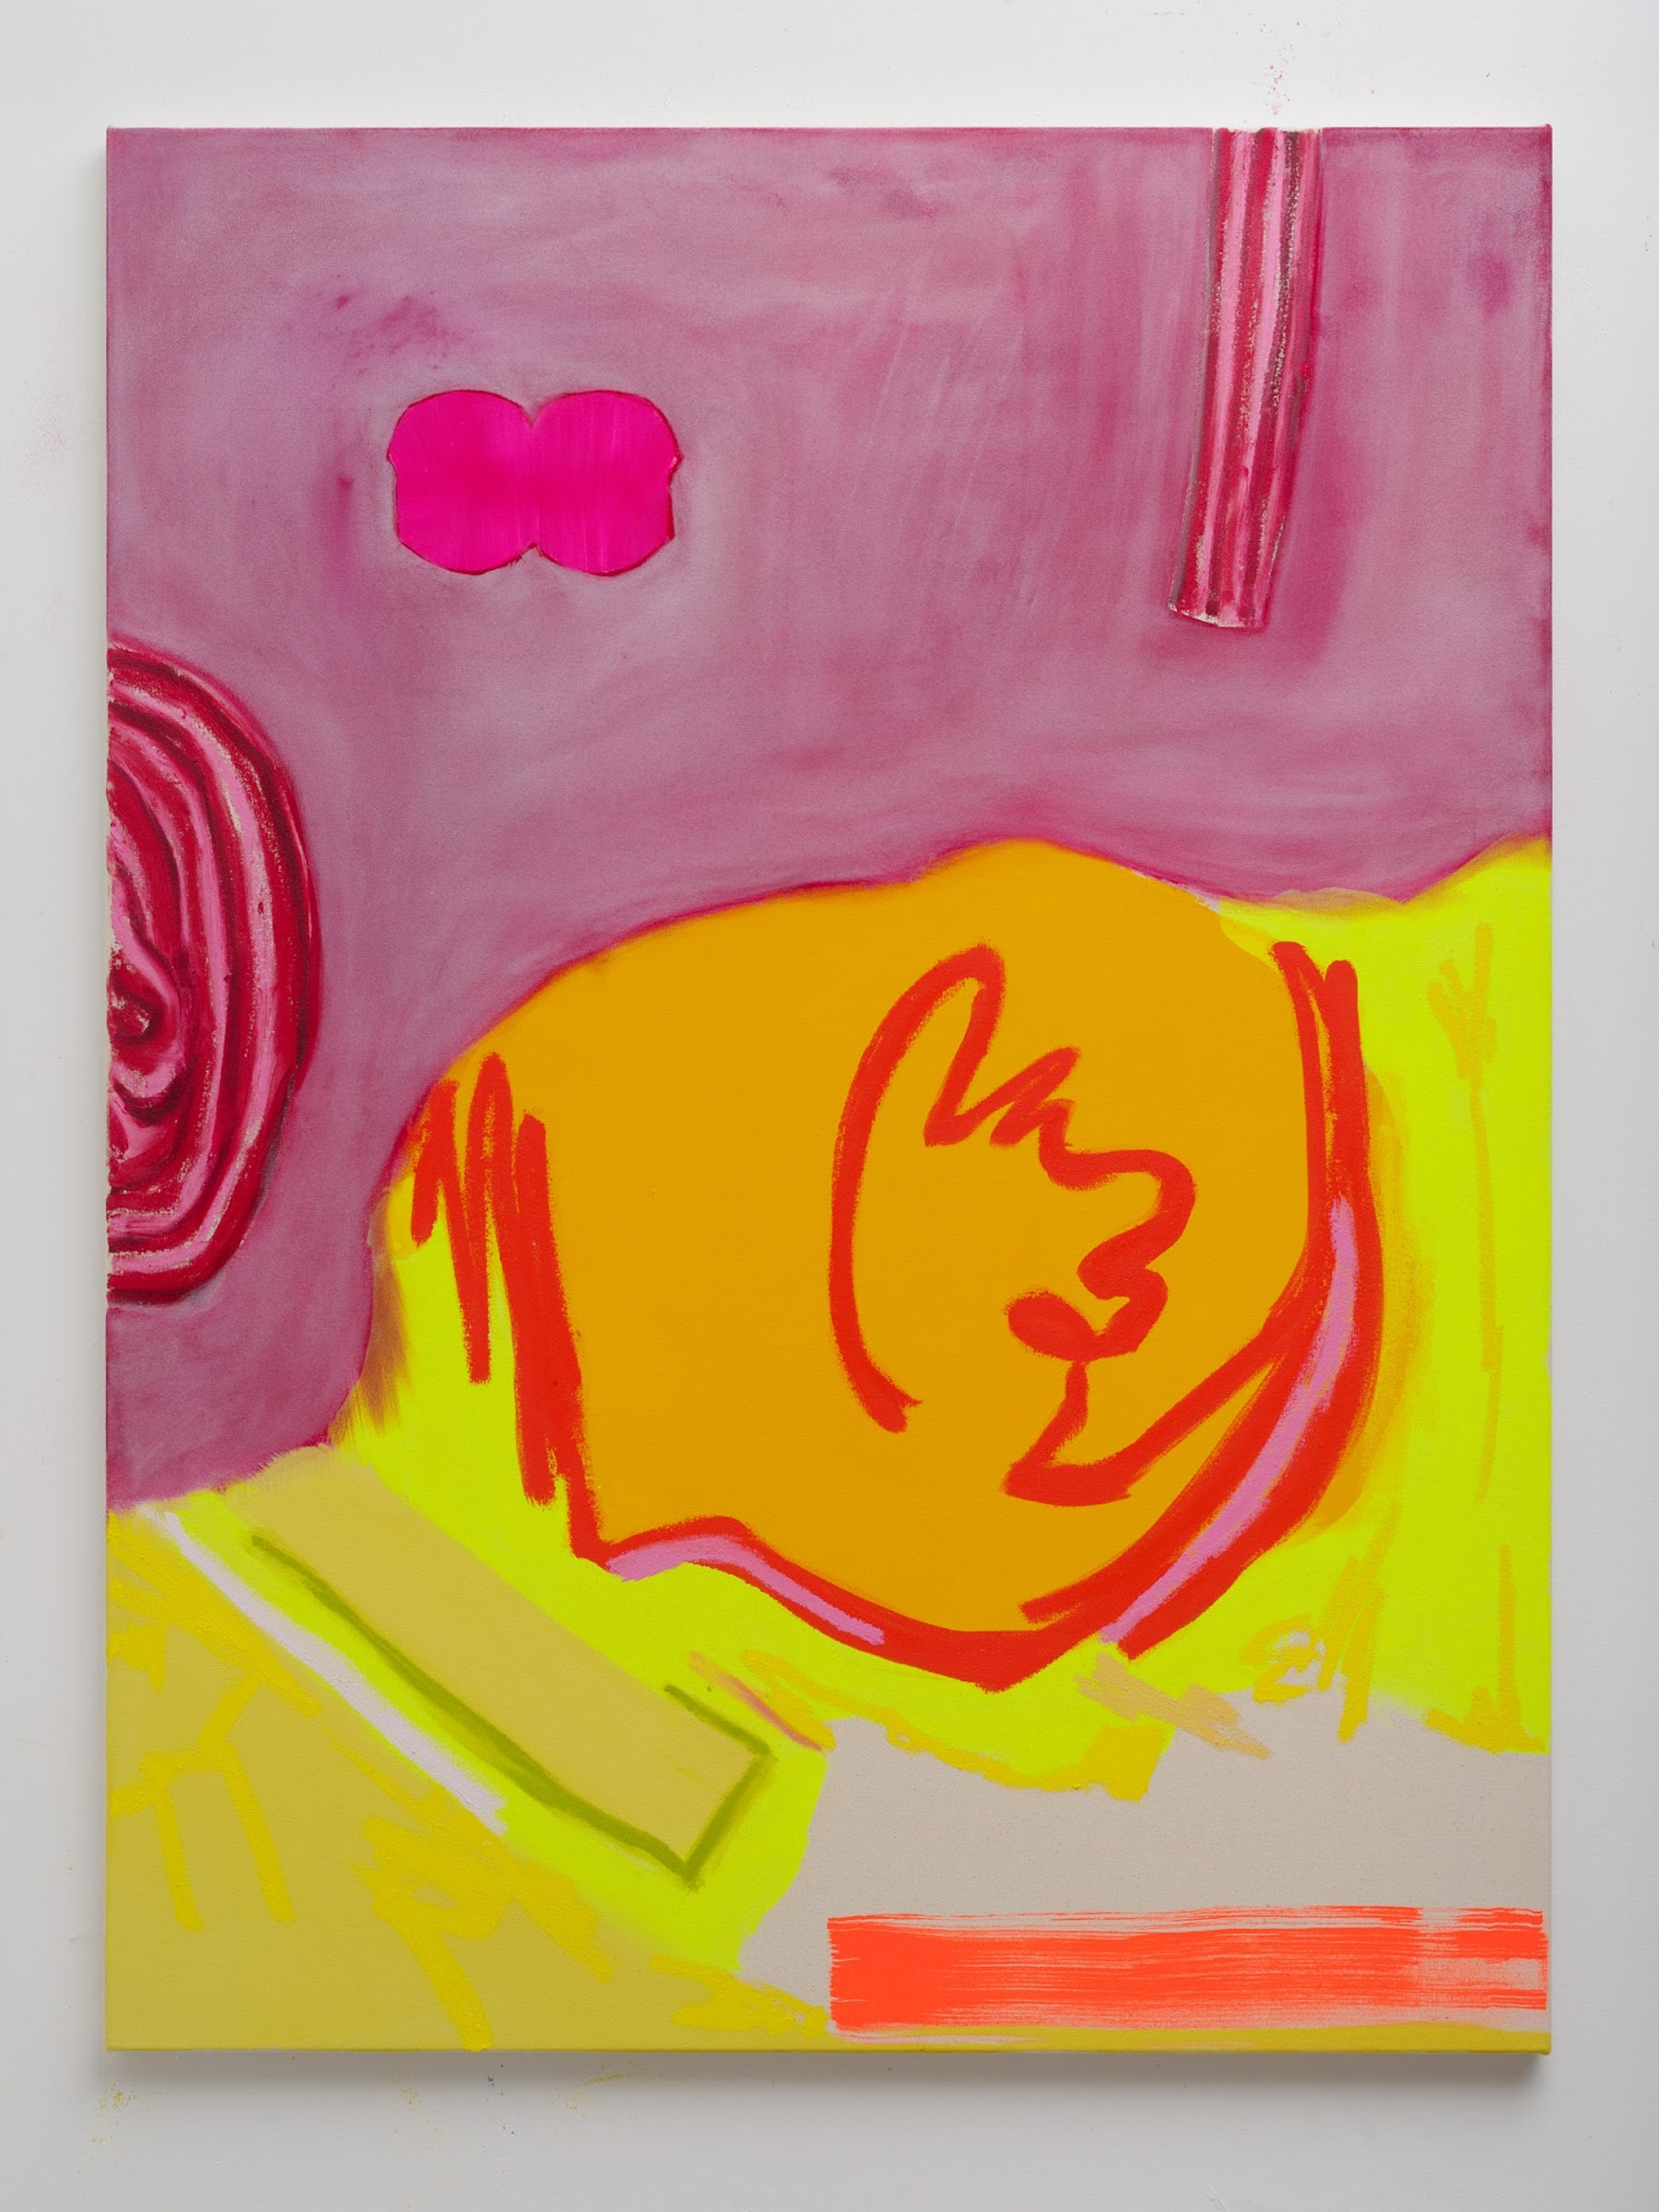 "Monique Van Genderen ""Snapshot 4,"" 2021 Oil on canvas 48"" x 36"" [HxW] (121.92 x 91.44 cm) Inventory #VGE416 Courtesy of the artist and Vielmetter Los Angeles Photo Credit: Jeff McLane"